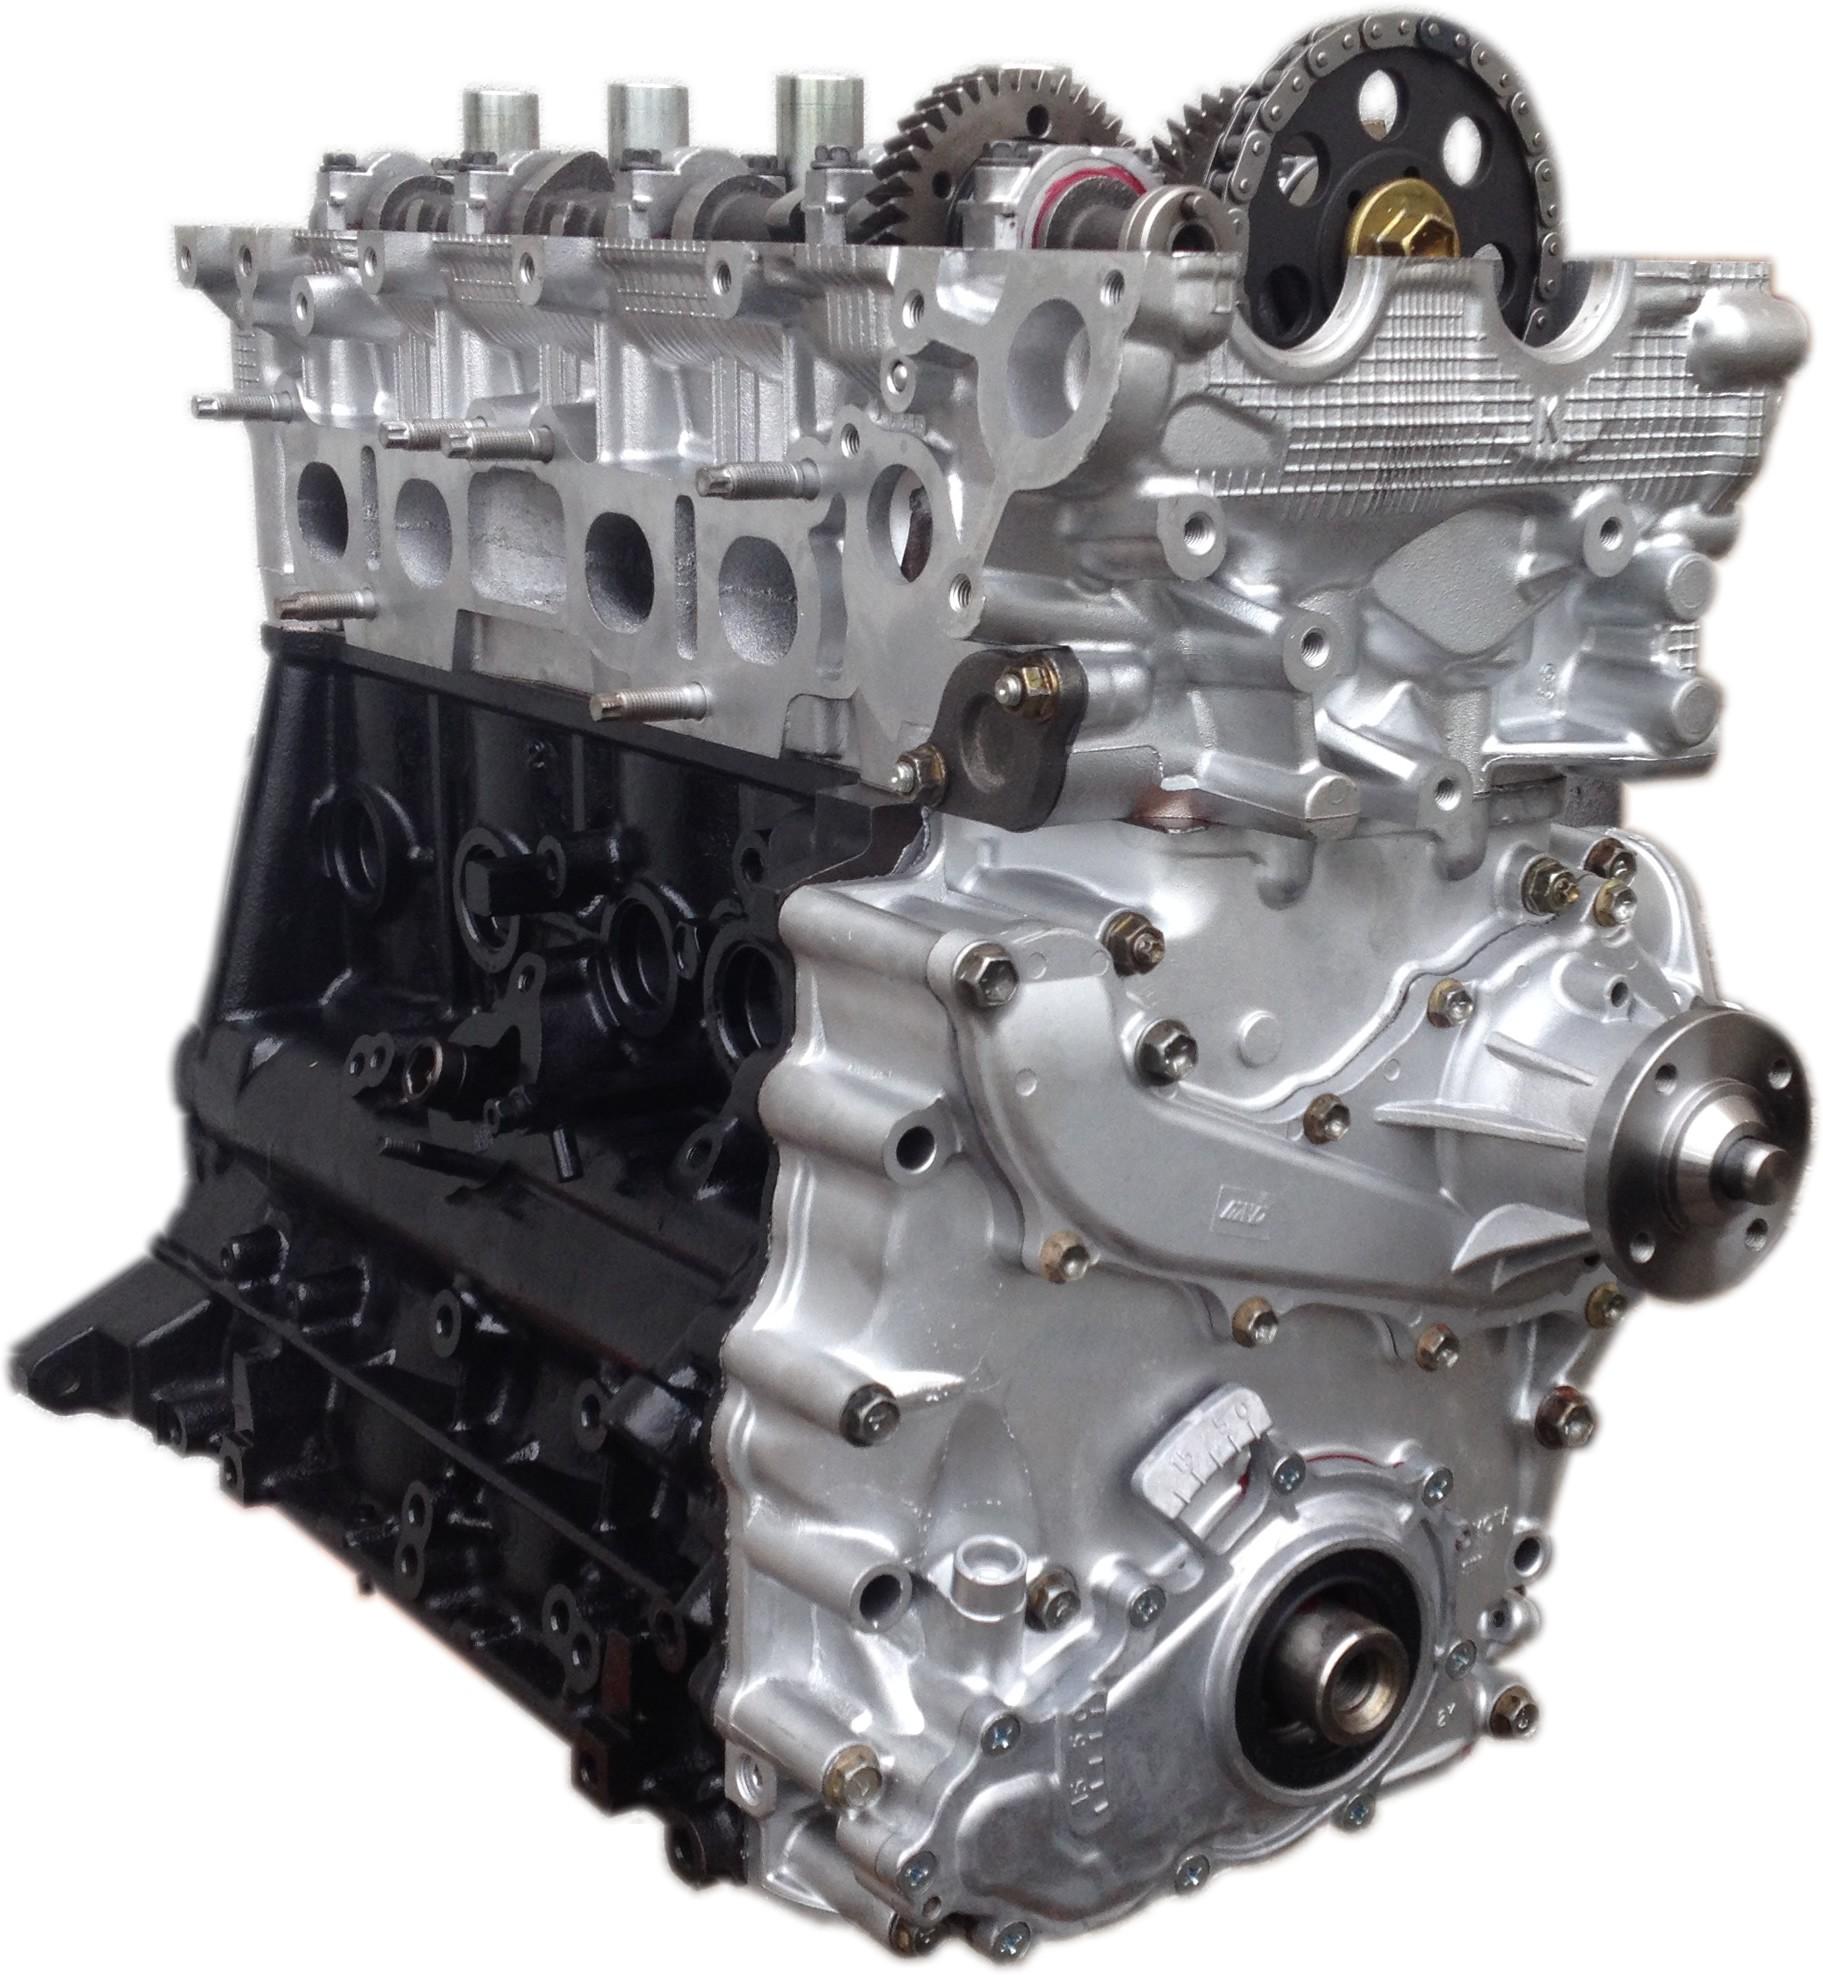 Pontiac 2 2 Engine Diagram Schematics Rebuilt 01 04 Toyota Tacoma 4wd 4cyl 2 7l 3rz Engine 171 Kar